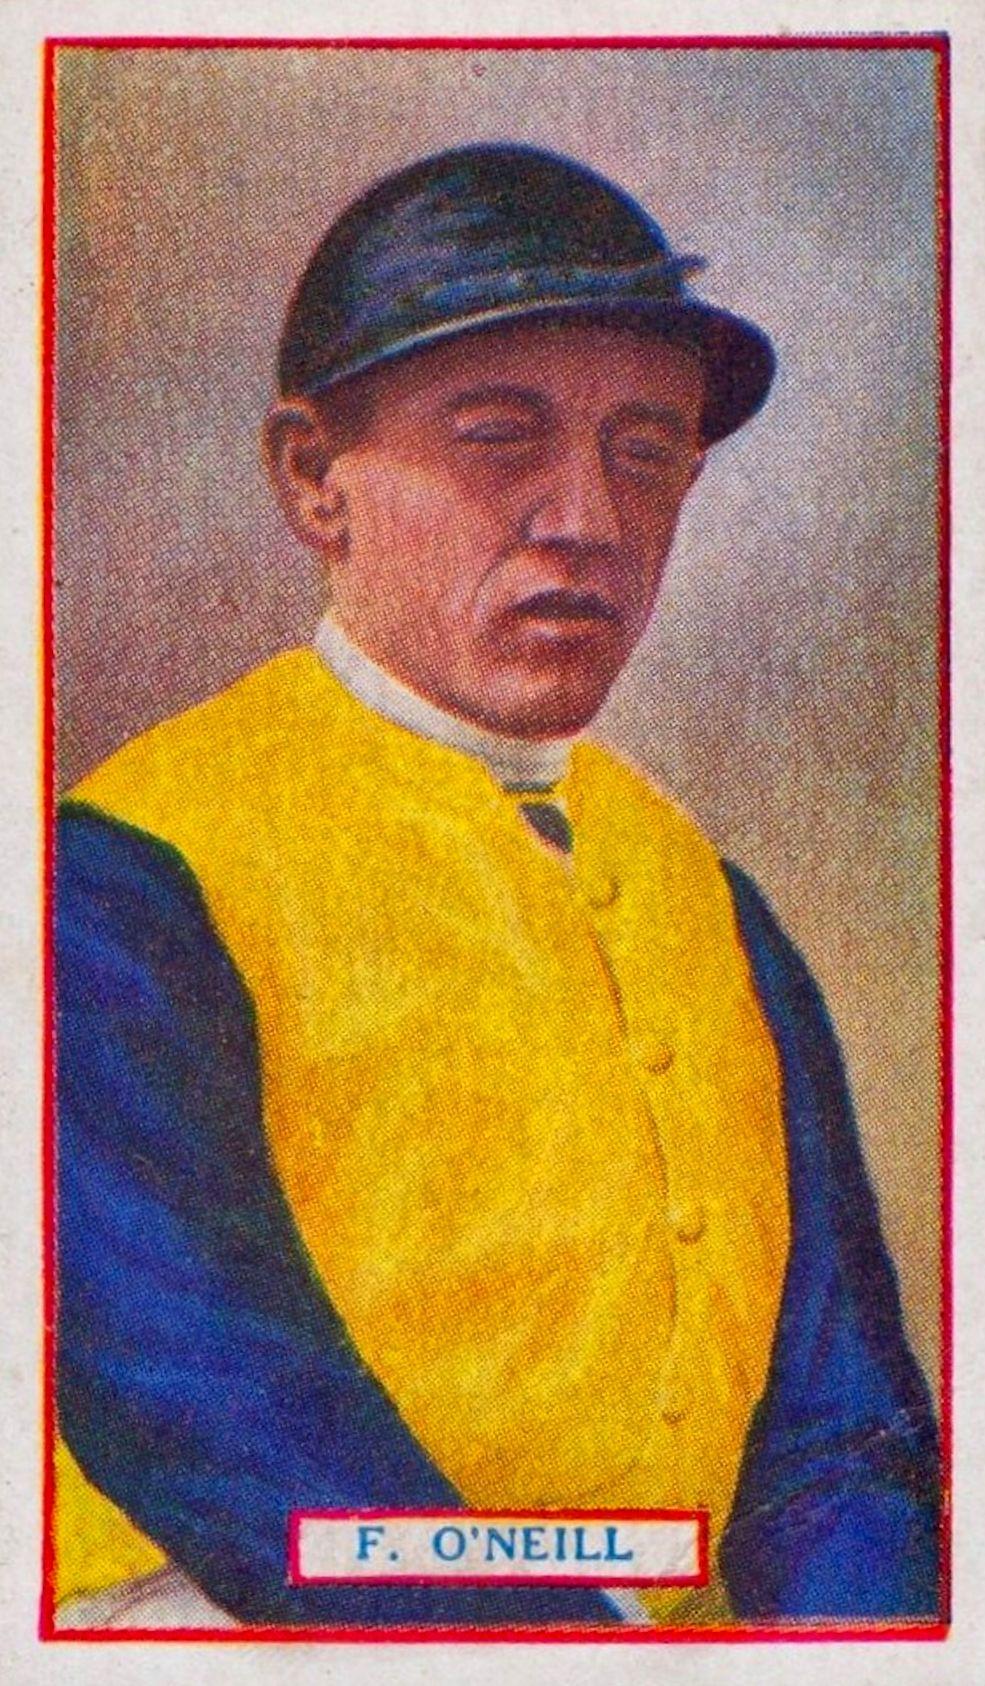 Frank O'Neill, 1923 Godfrey Phillips jockey card (Museum Collection)